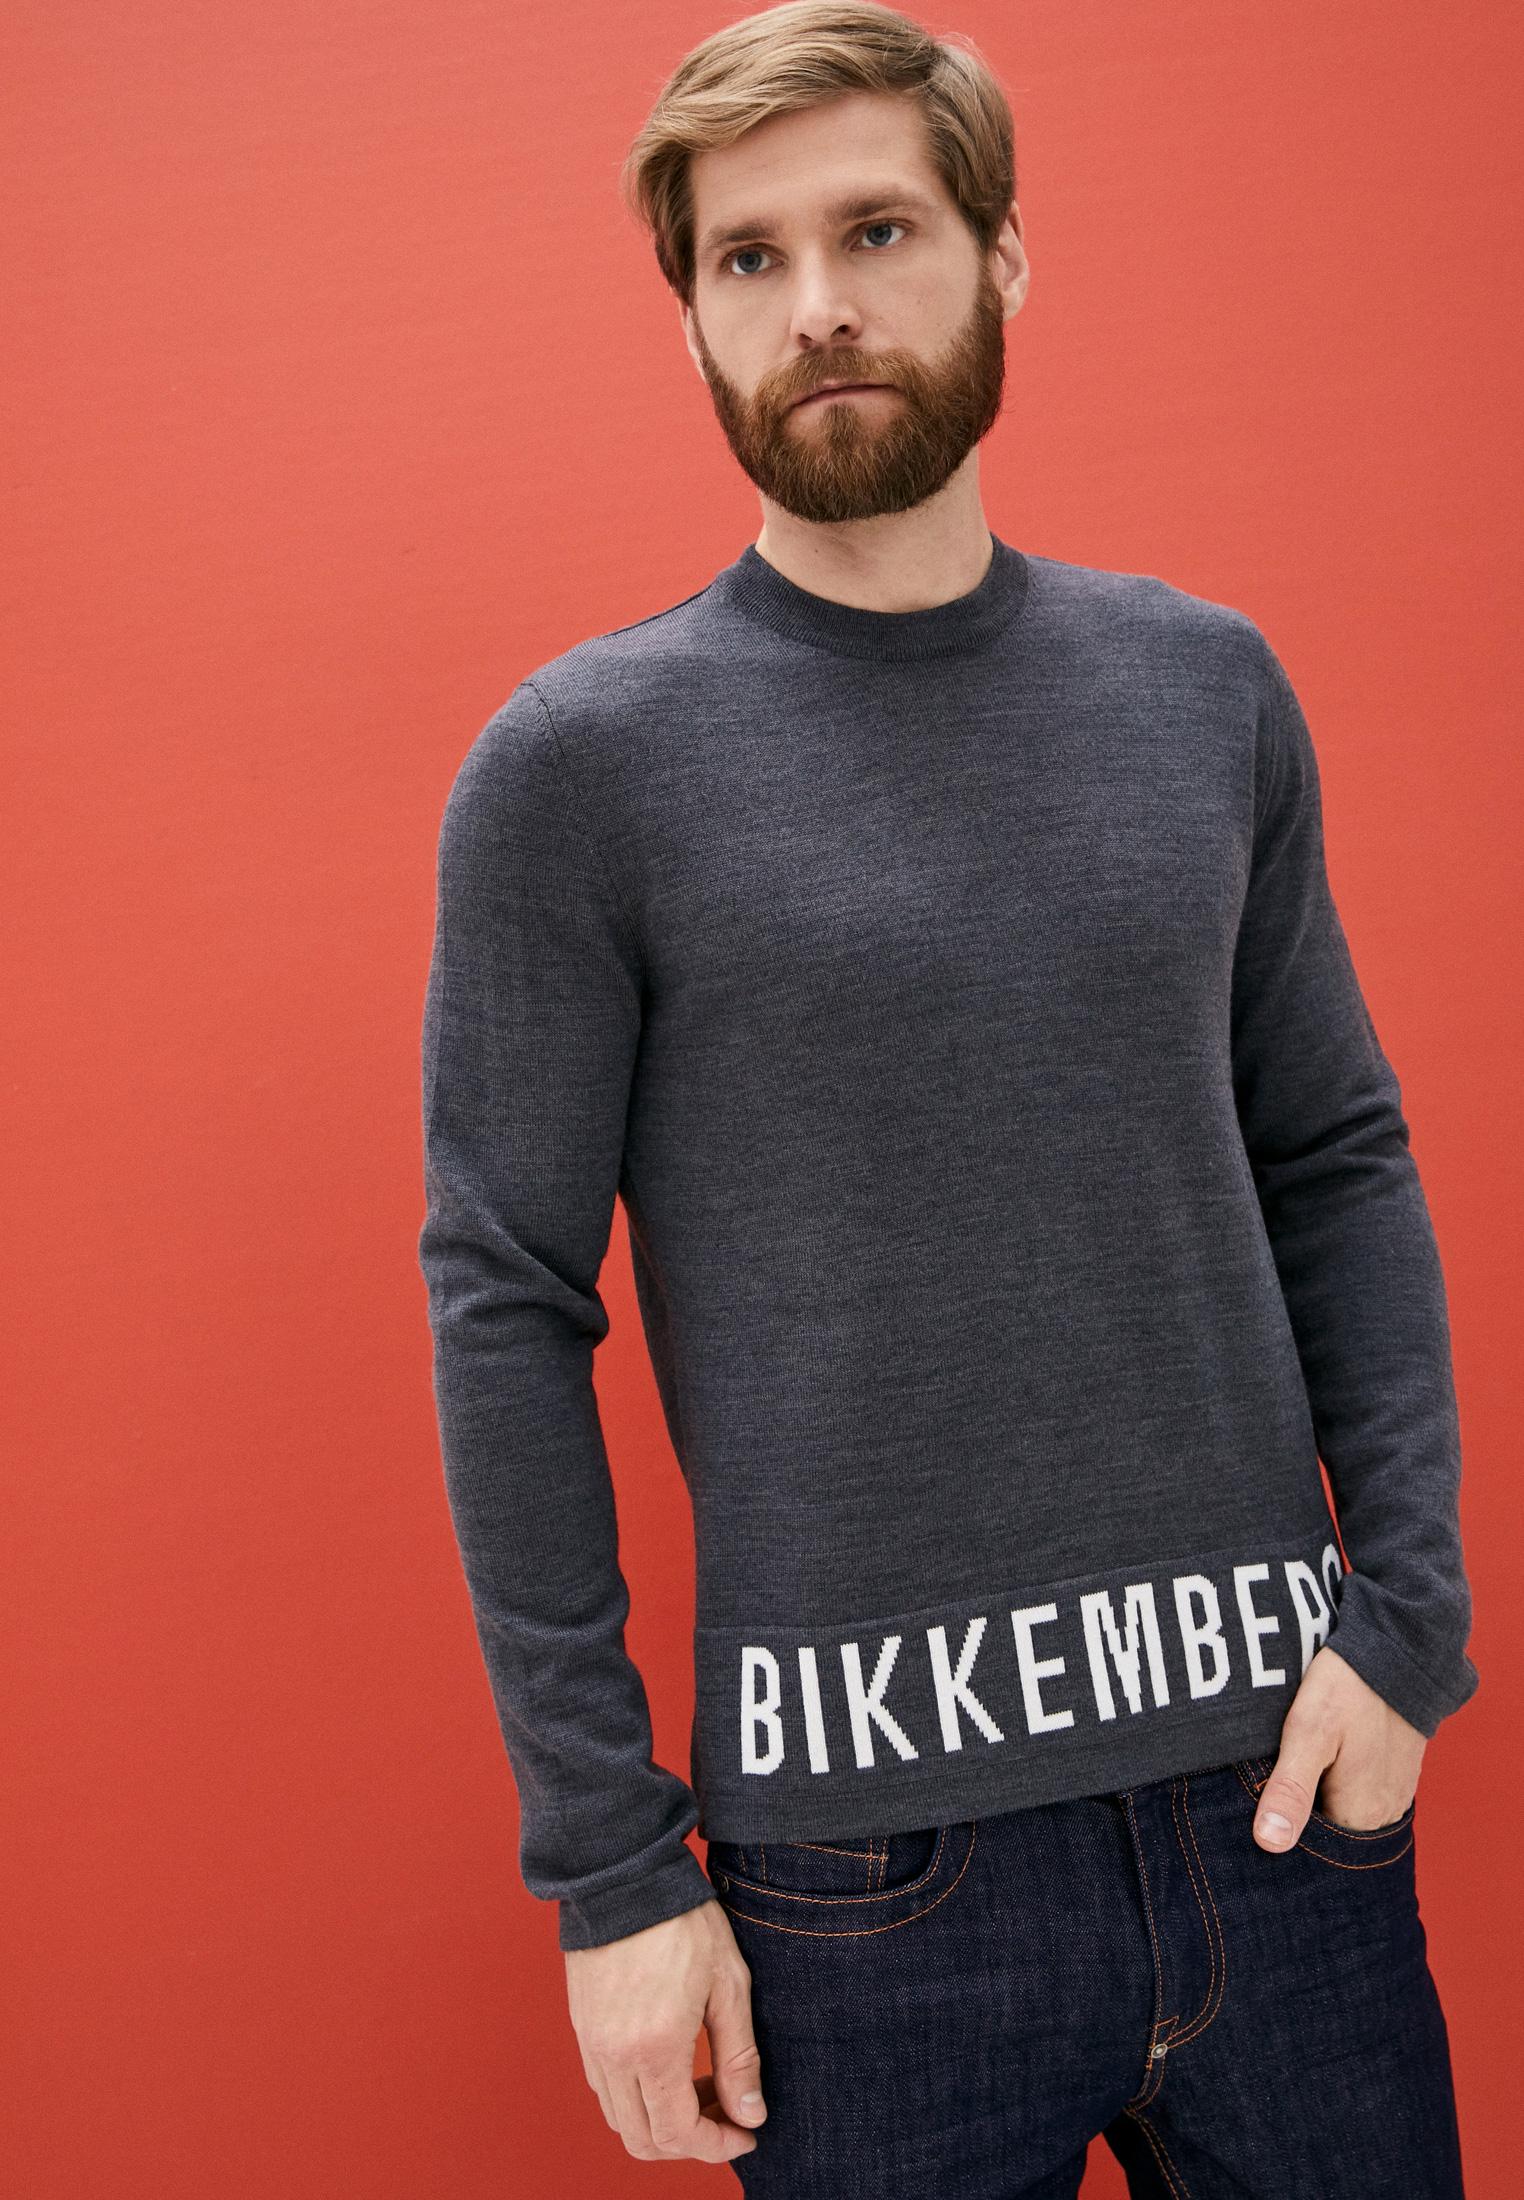 Джемпер Bikkembergs (Биккембергс) c s g83 10 x 1306: изображение 2